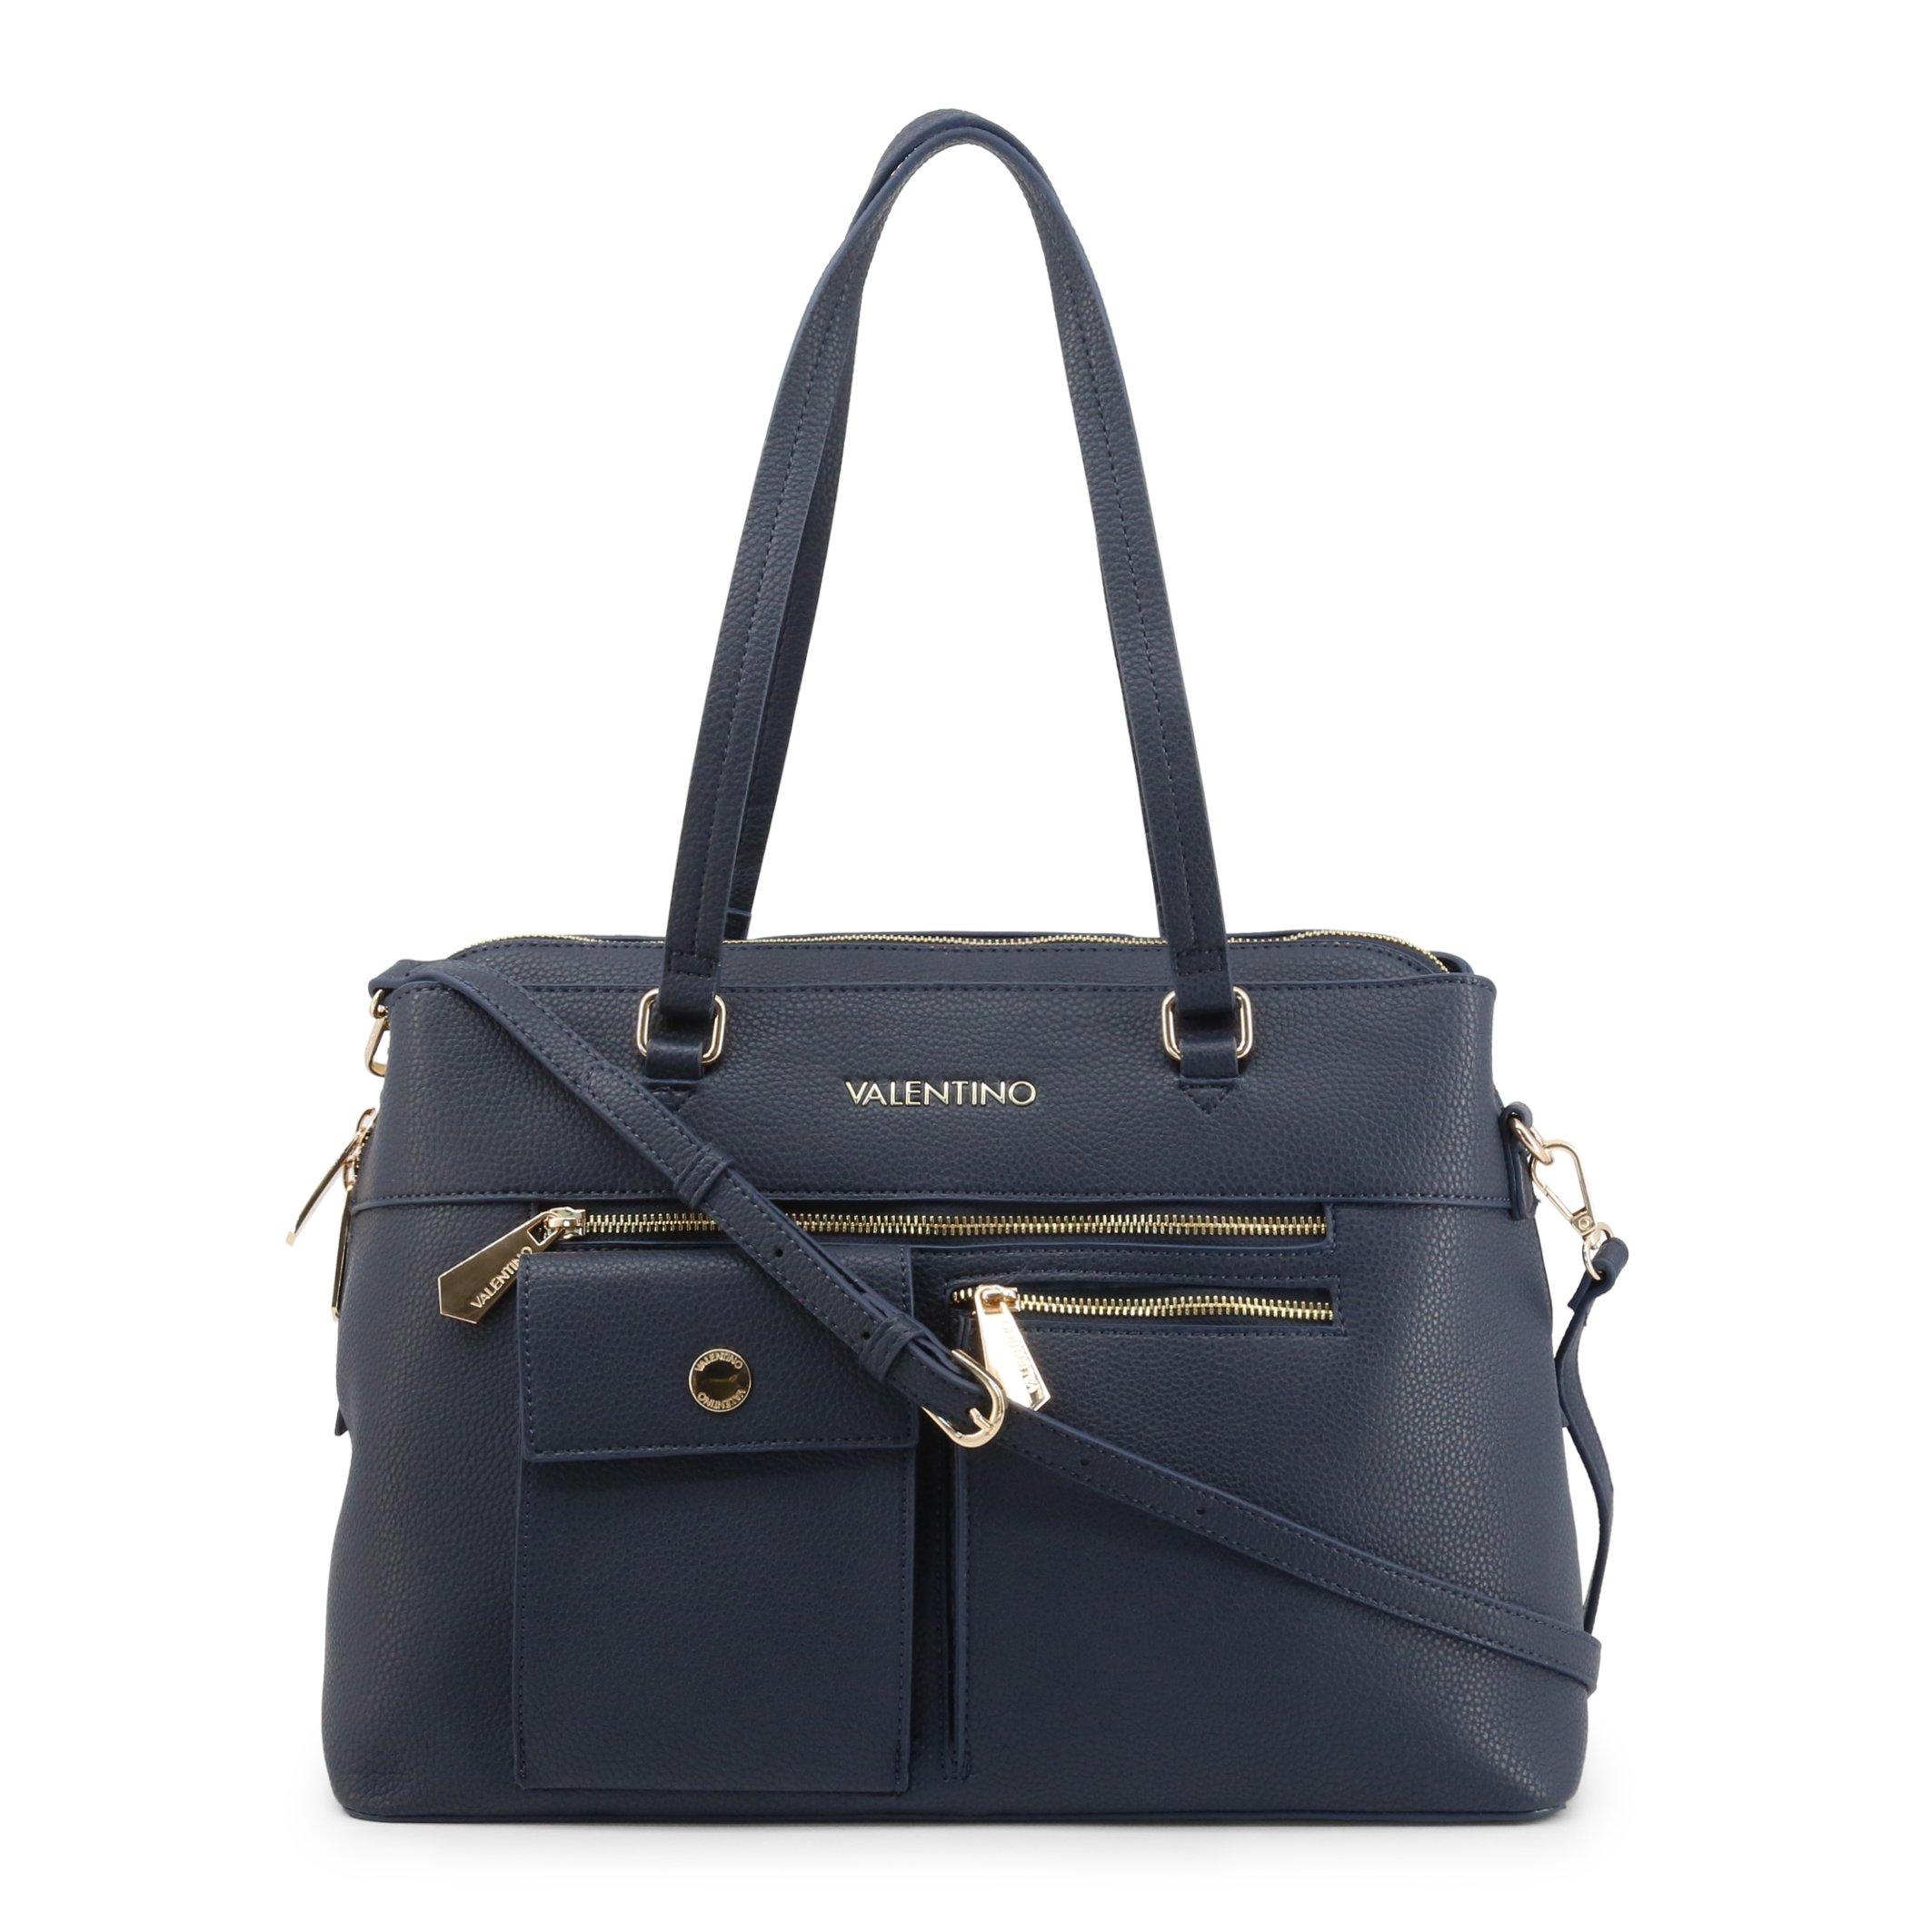 Valentino by Mario Valentino Women's Shoulder Bag Various Colours CASPER-VBS3XL05 - blue NOSIZE